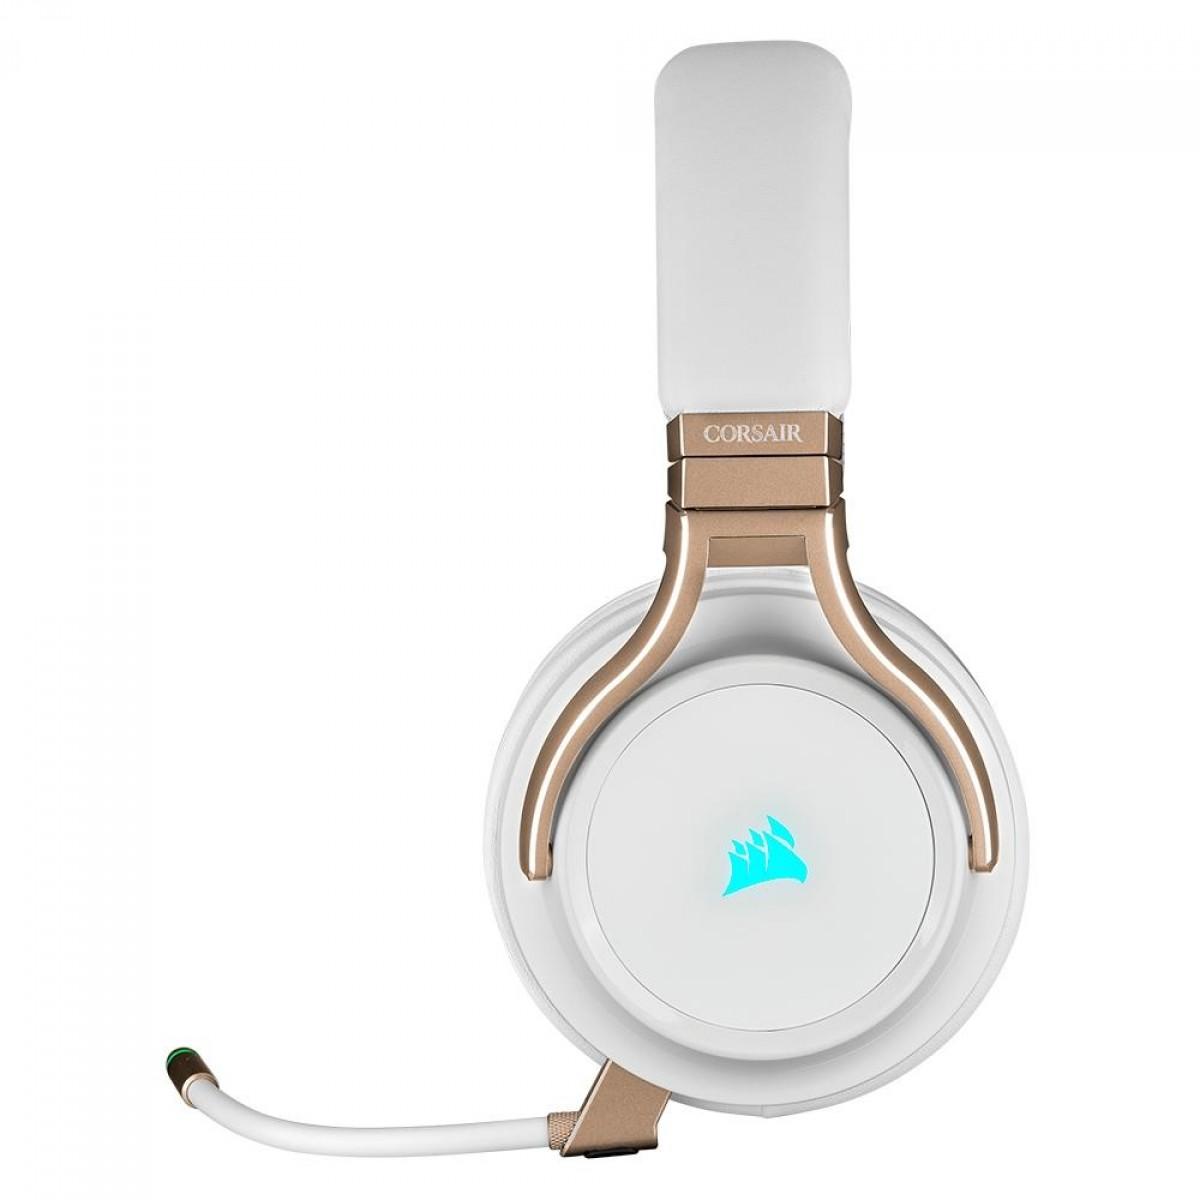 Headset Gamer Corsair Virtuoso Pérola, Sem fio/USB/3.5mm, Múltplas Plataformas, RGB, CA-9011224-NA